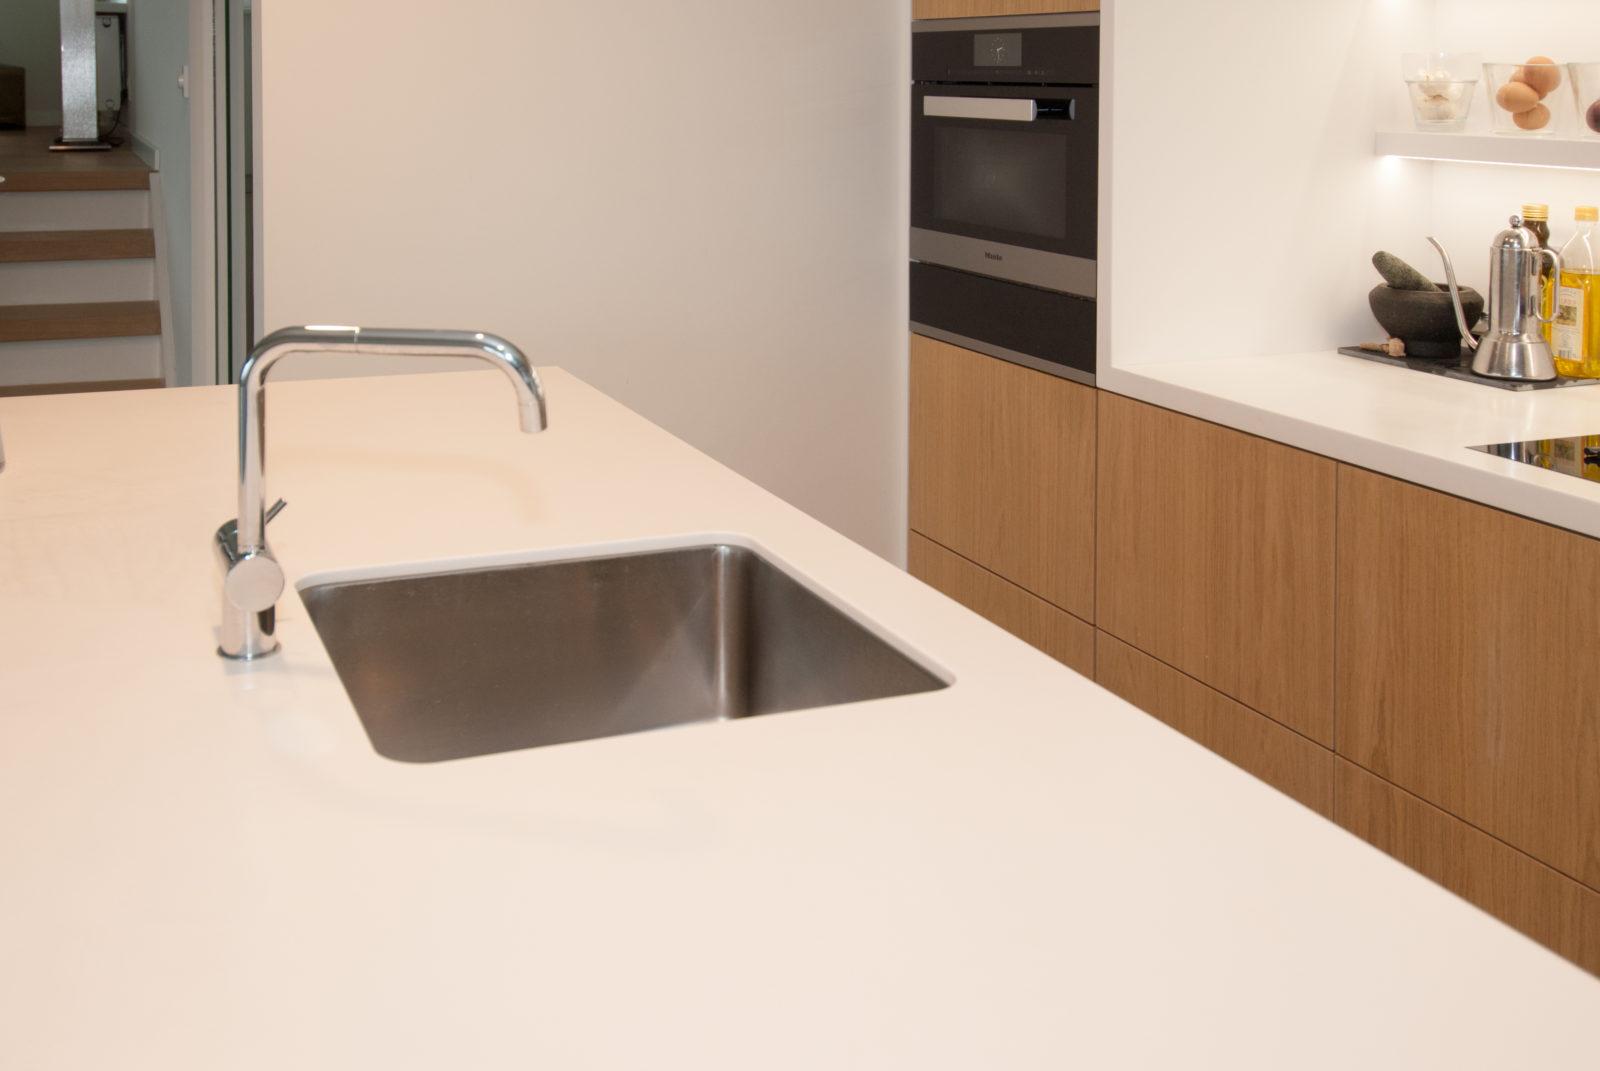 interieurbouw noteboom - wit keukeneiland